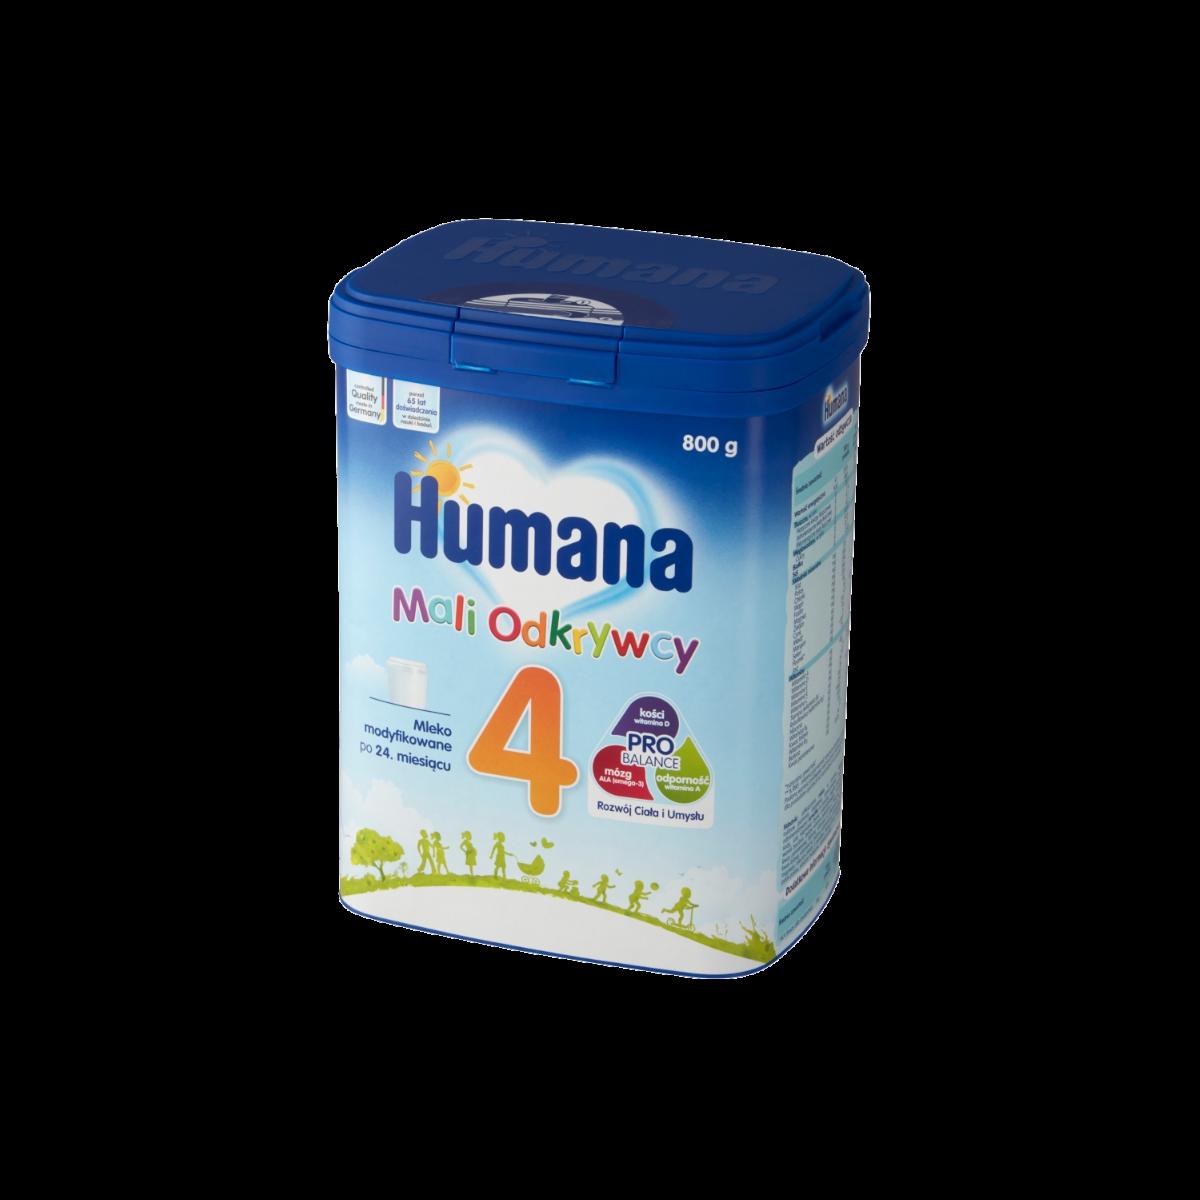 humana_4_800g